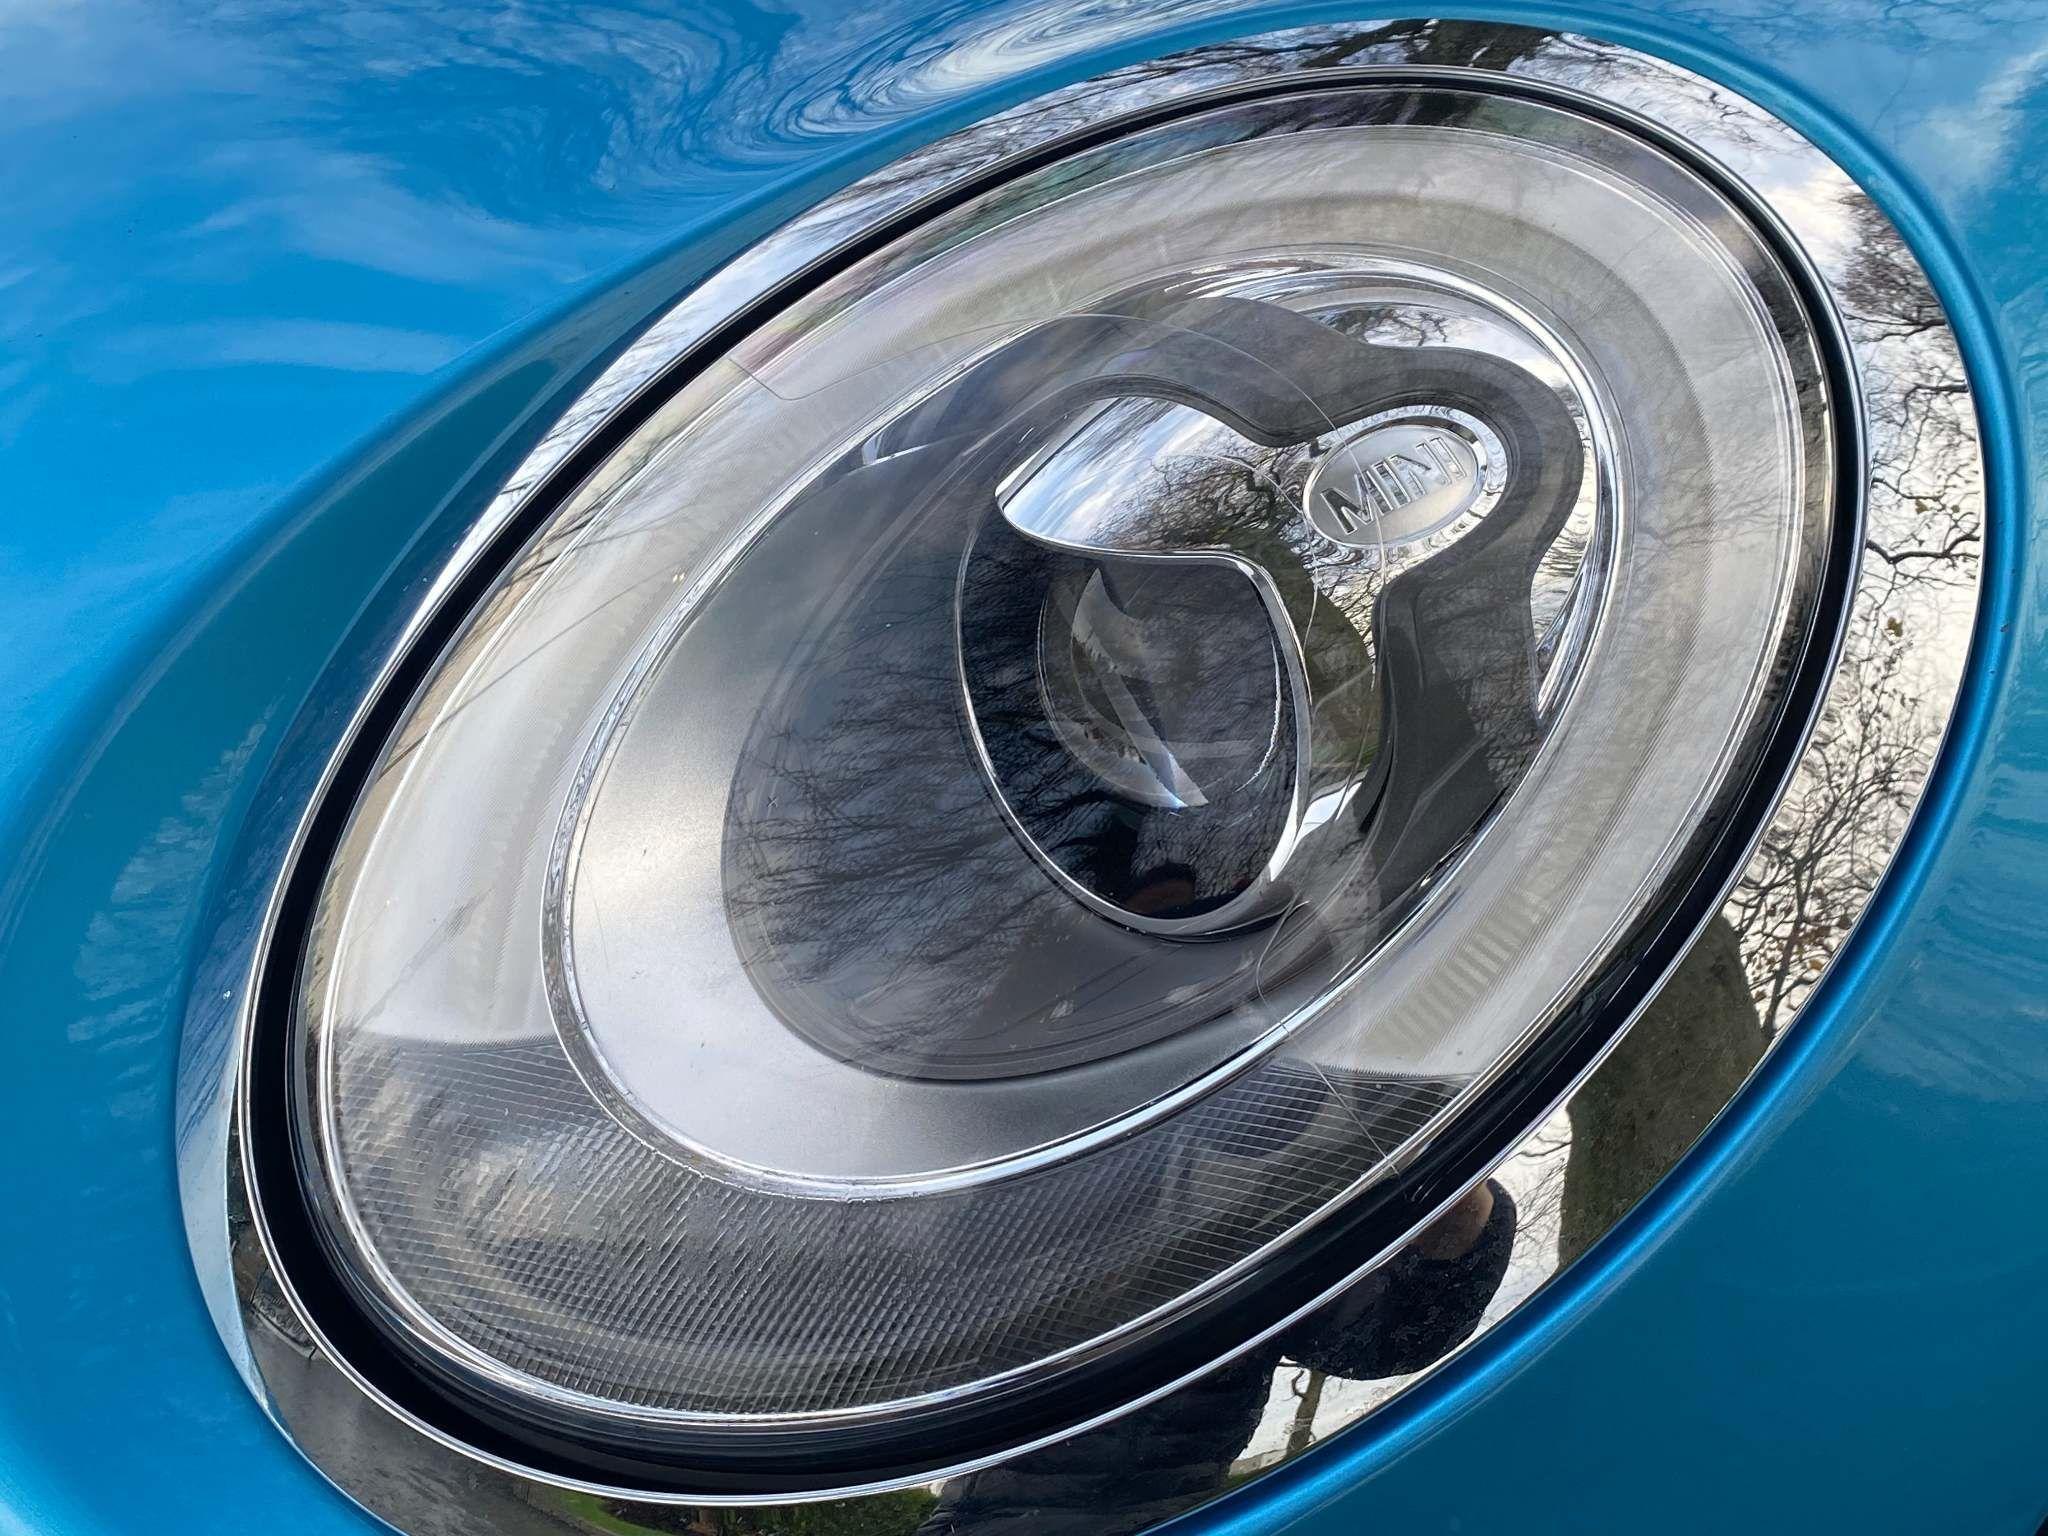 2017 MINI HATCH 1.5 Cooper D (s/s) 5dr Diesel Manual – Moyway Motors Dungannon full